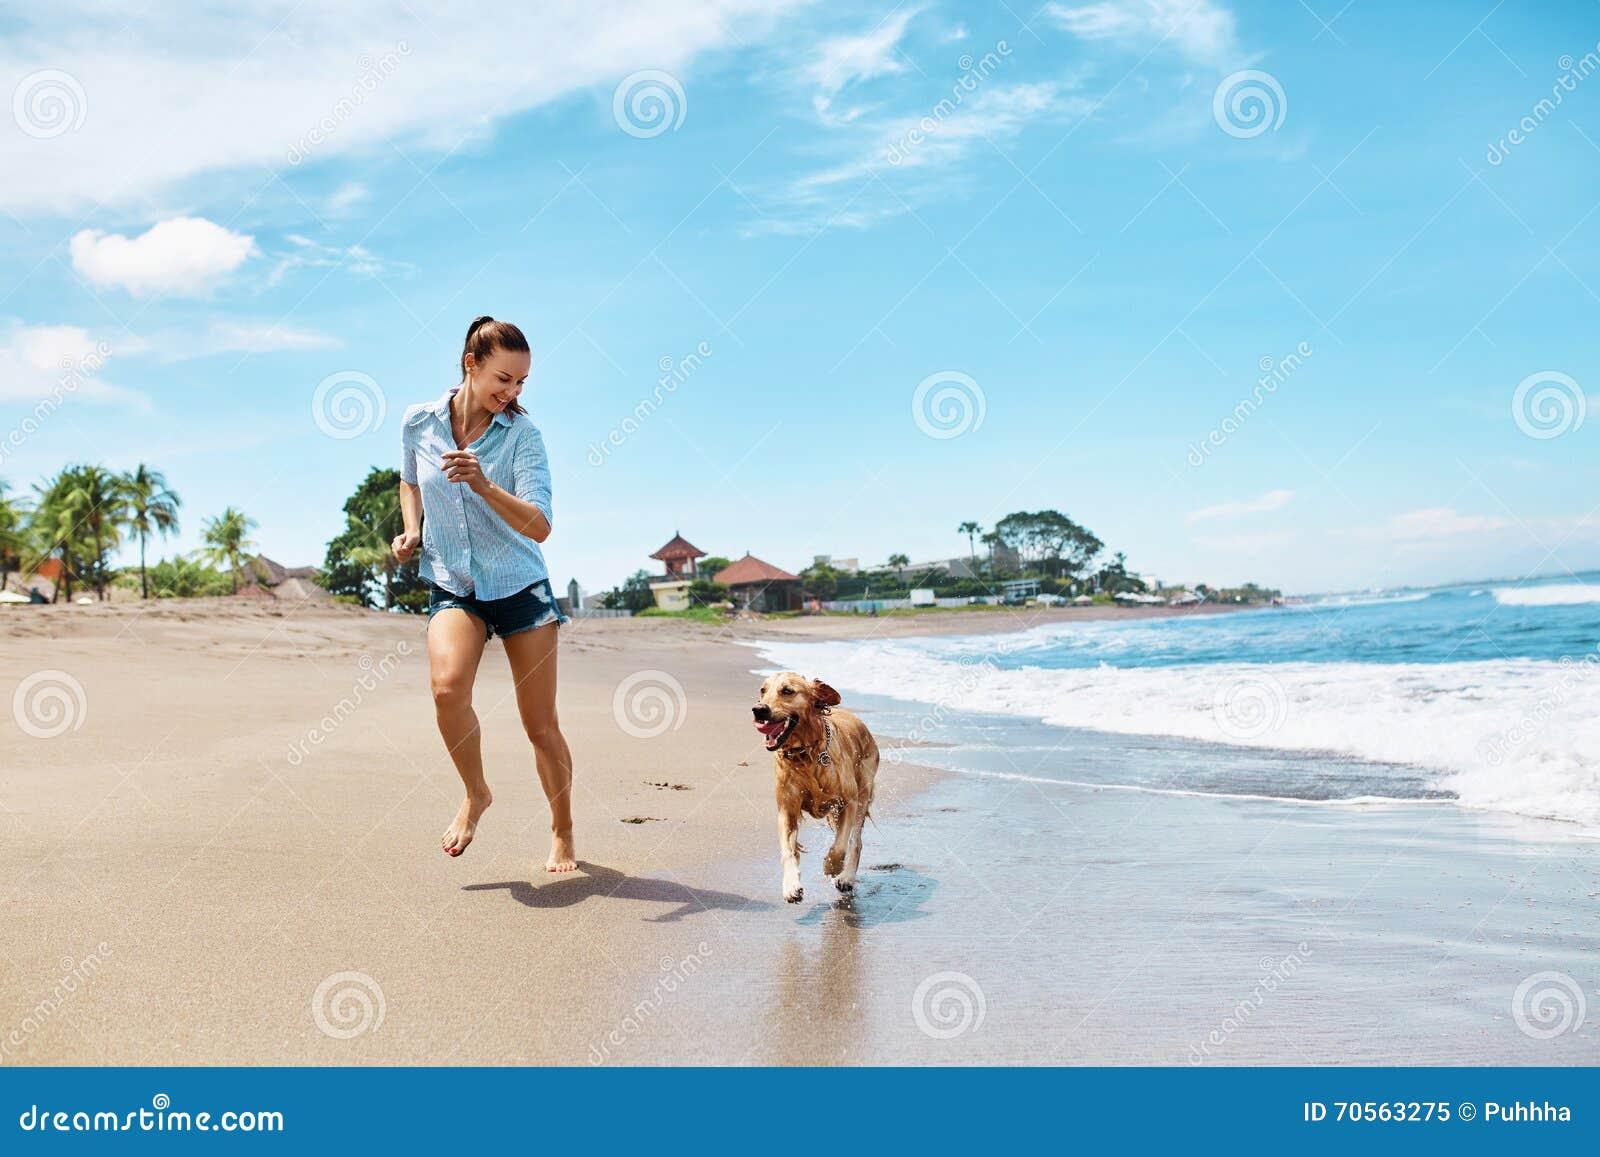 Summer Beach Fun. Woman Running With Dog. Holidays Vacations. Summer